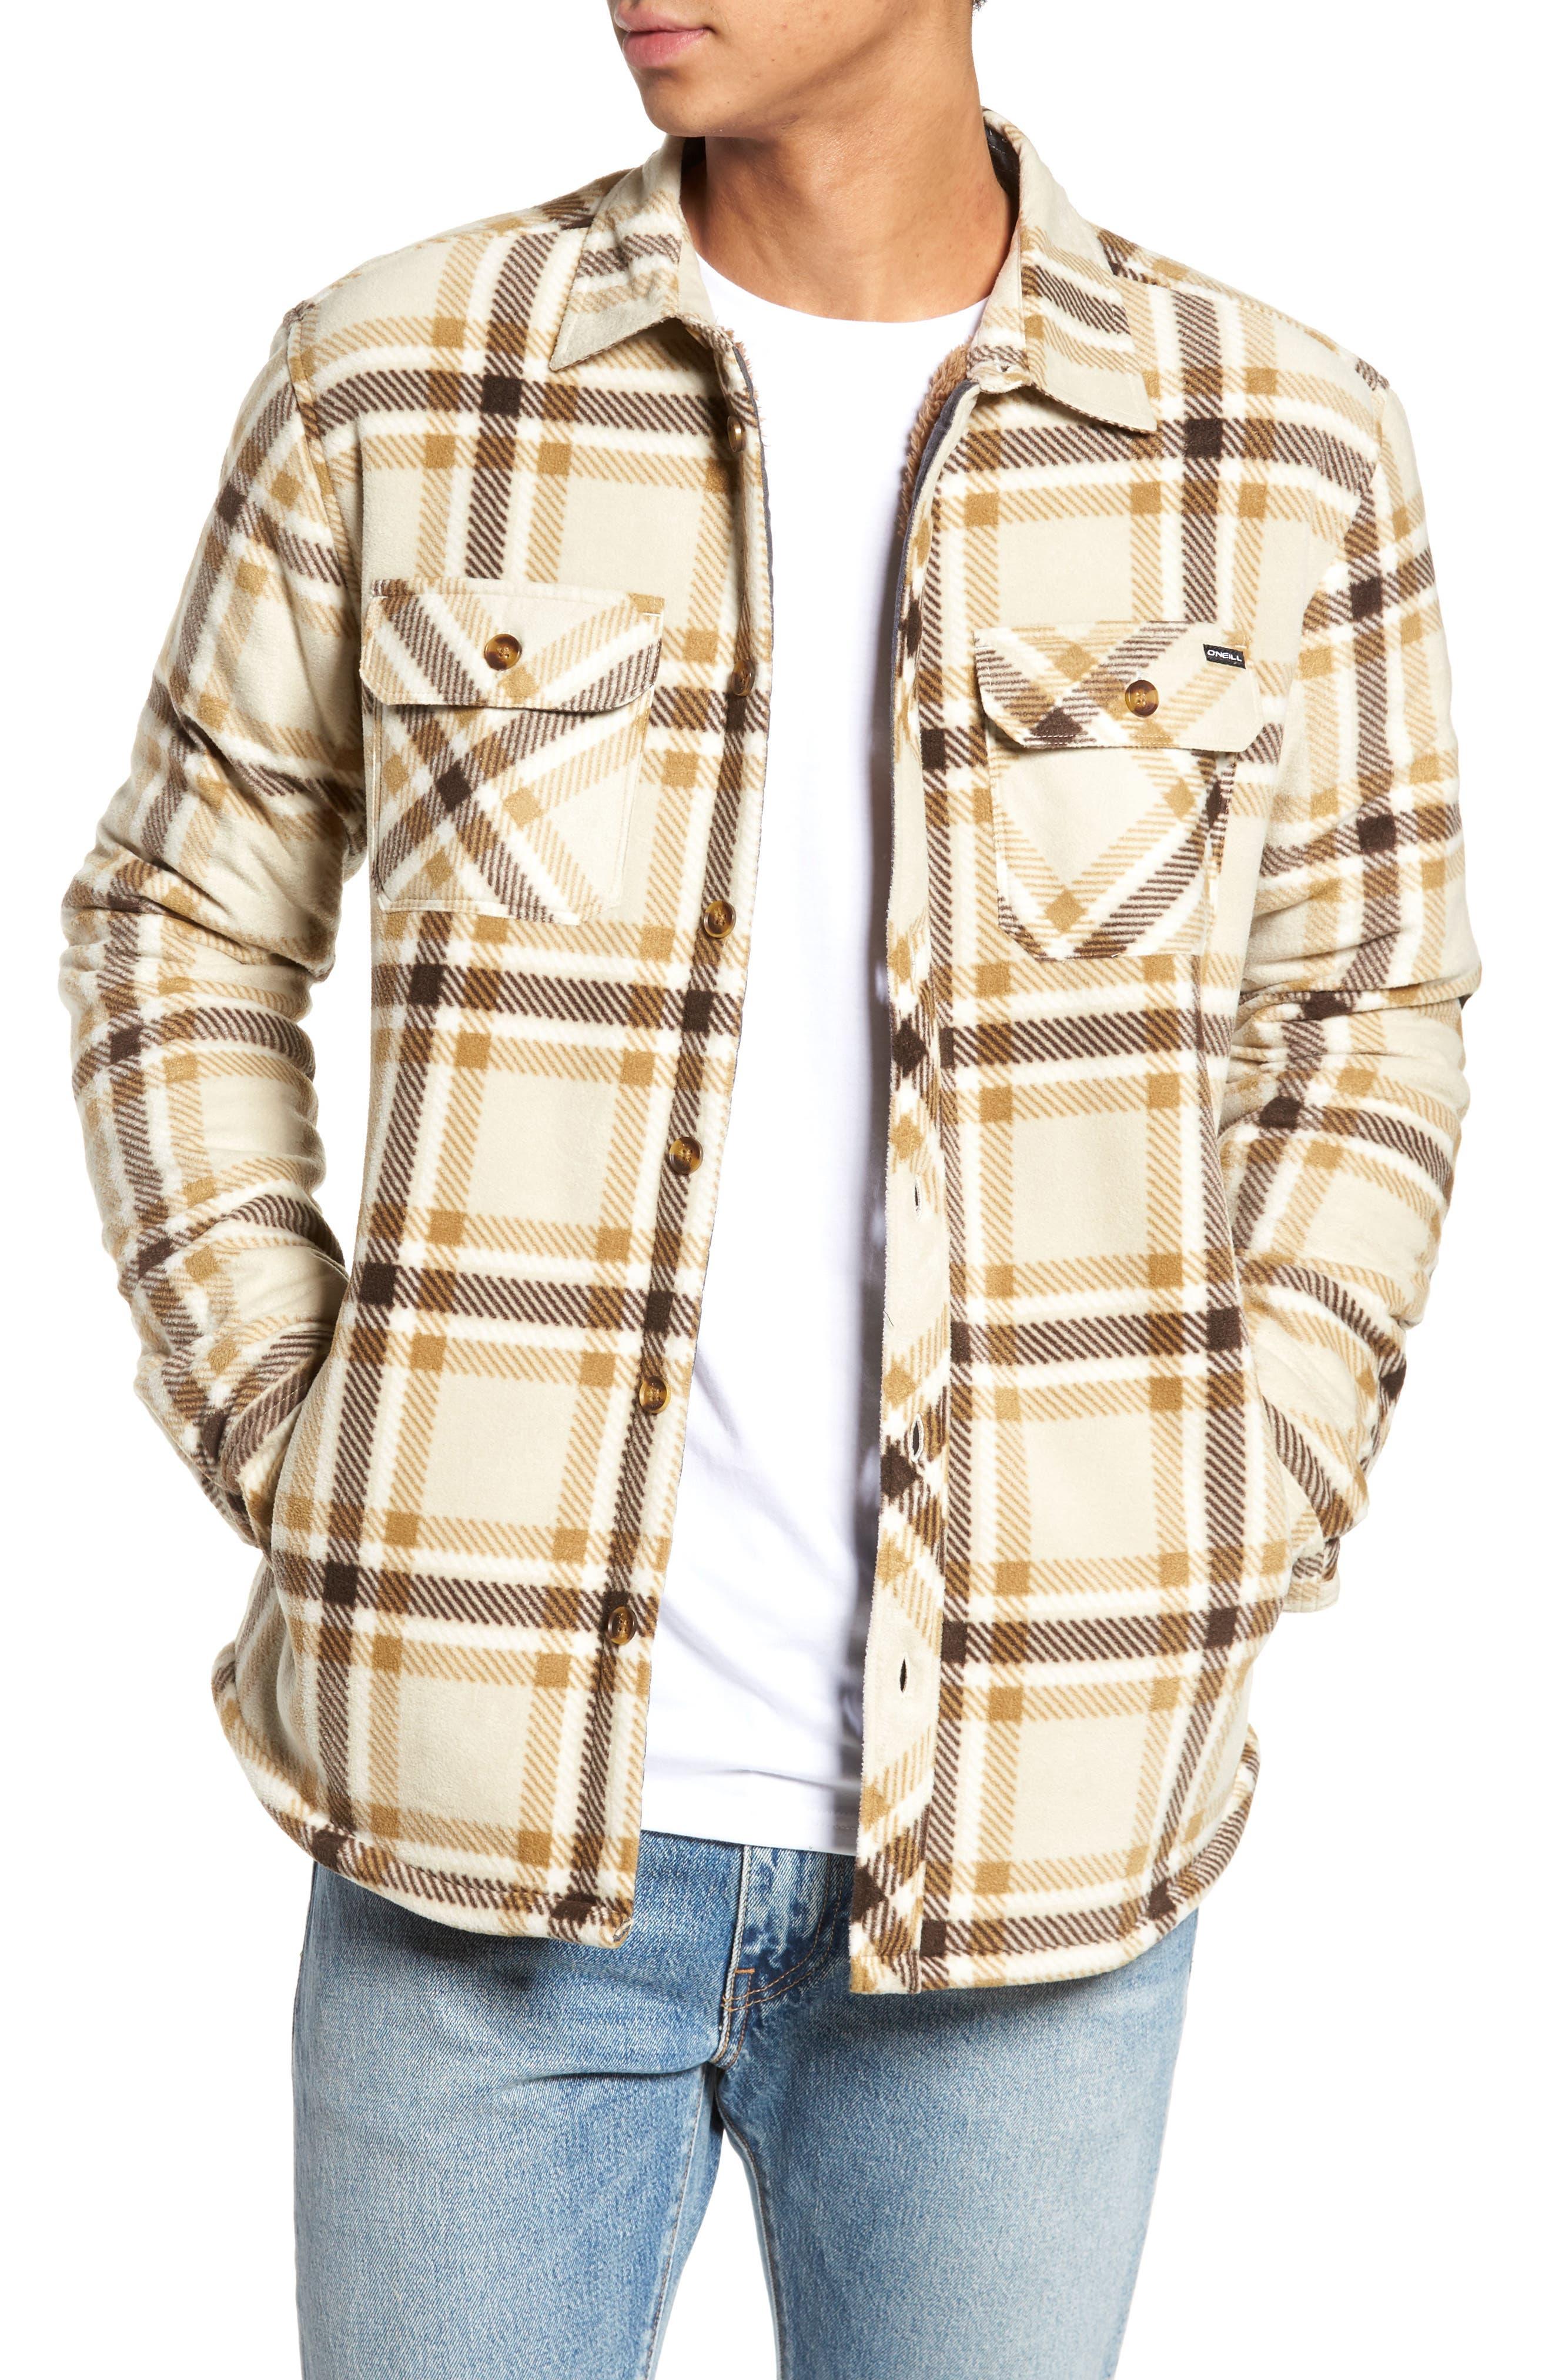 Main Image - O'Neill Glacier Heat Dome Plaid Fleece Shirt